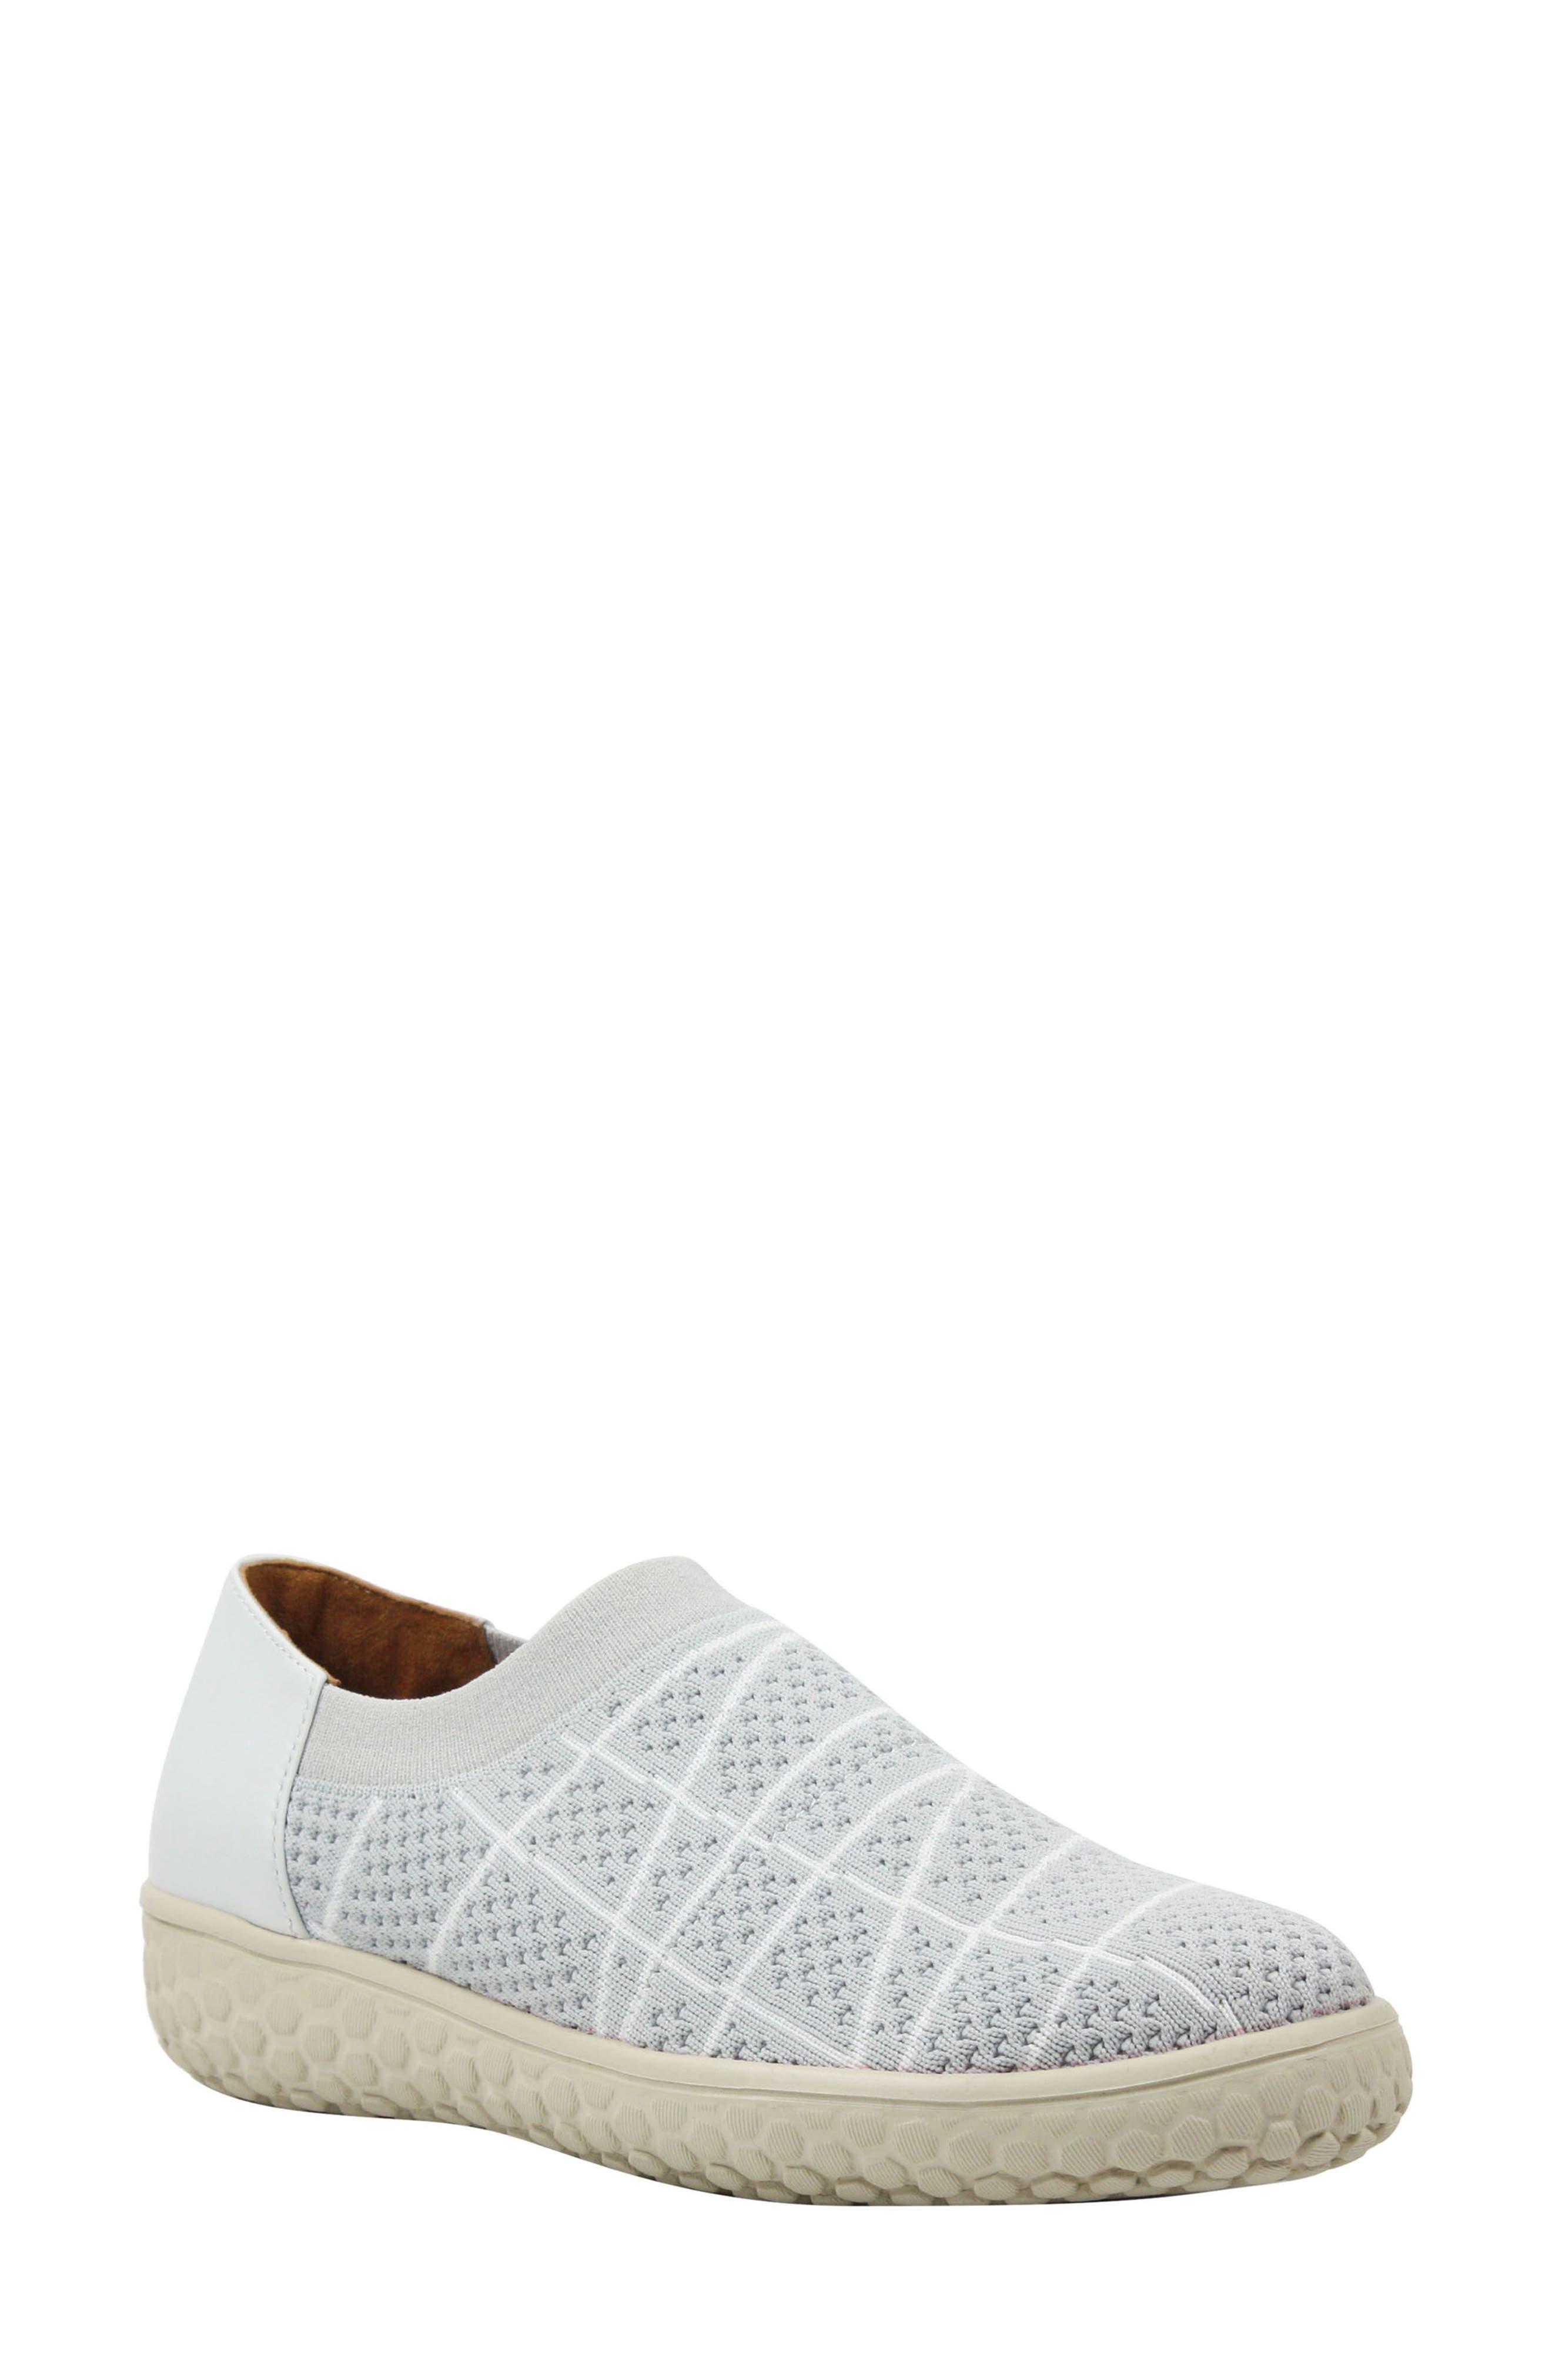 Zohndra Slip-On Sneaker,                             Main thumbnail 1, color,                             Beige Fabric